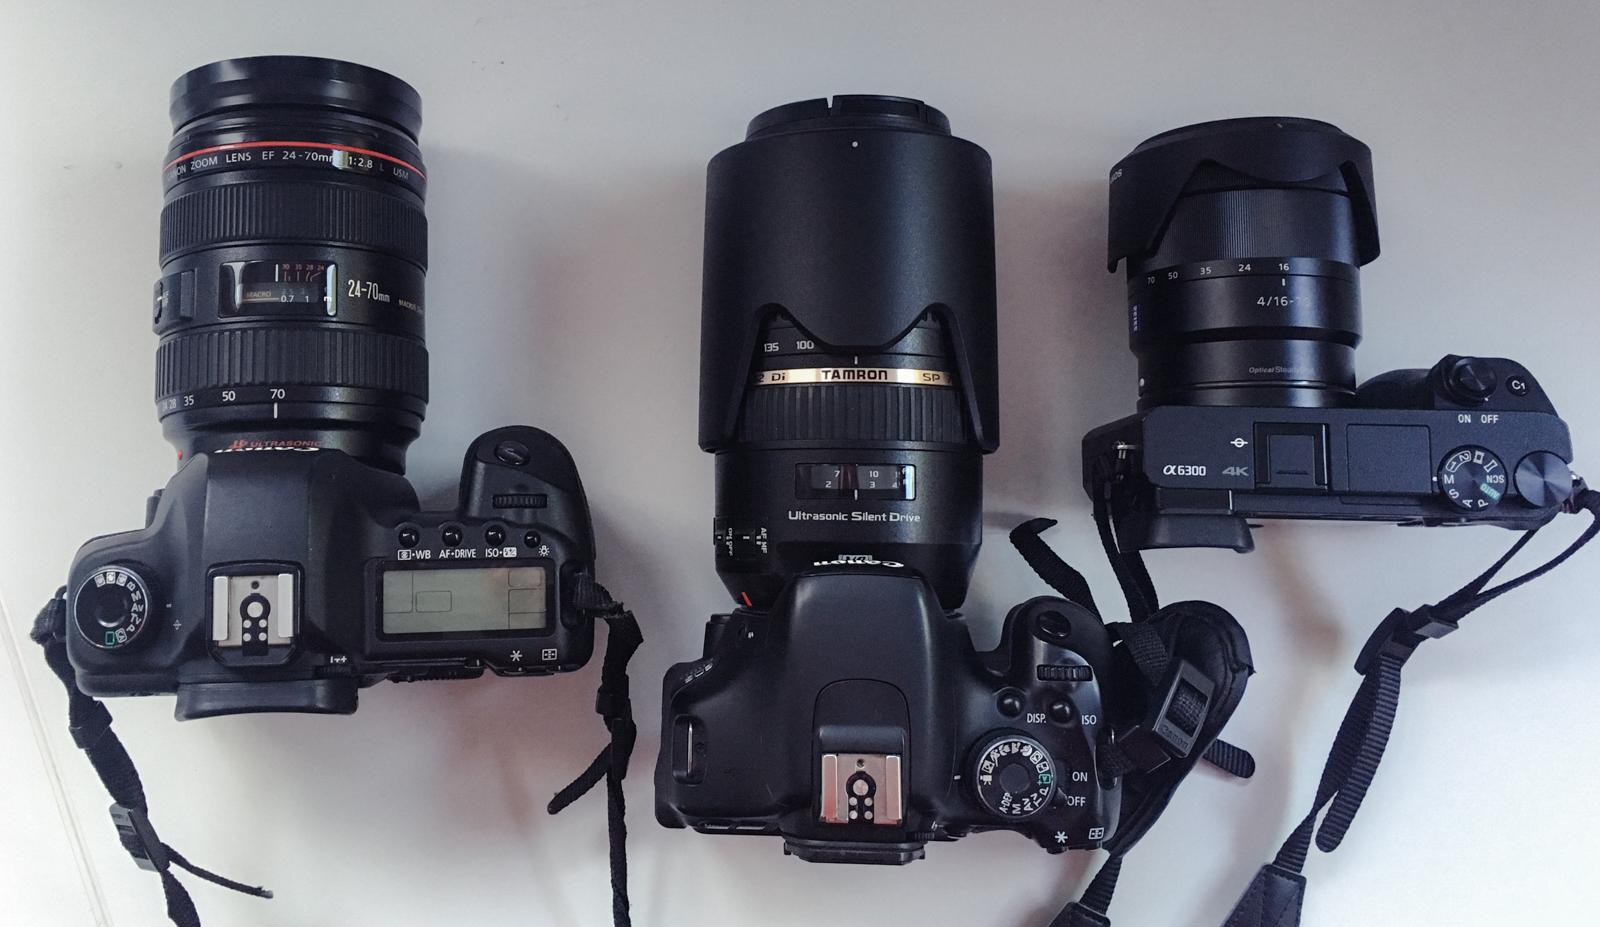 Thomas Brand Equipment Ebersberg München Fotografie Fotograf Cinemagraph Portrait Fashion Video Blog Kamera Sony Canon Alpha 6300 Zeiss Ausrüstung